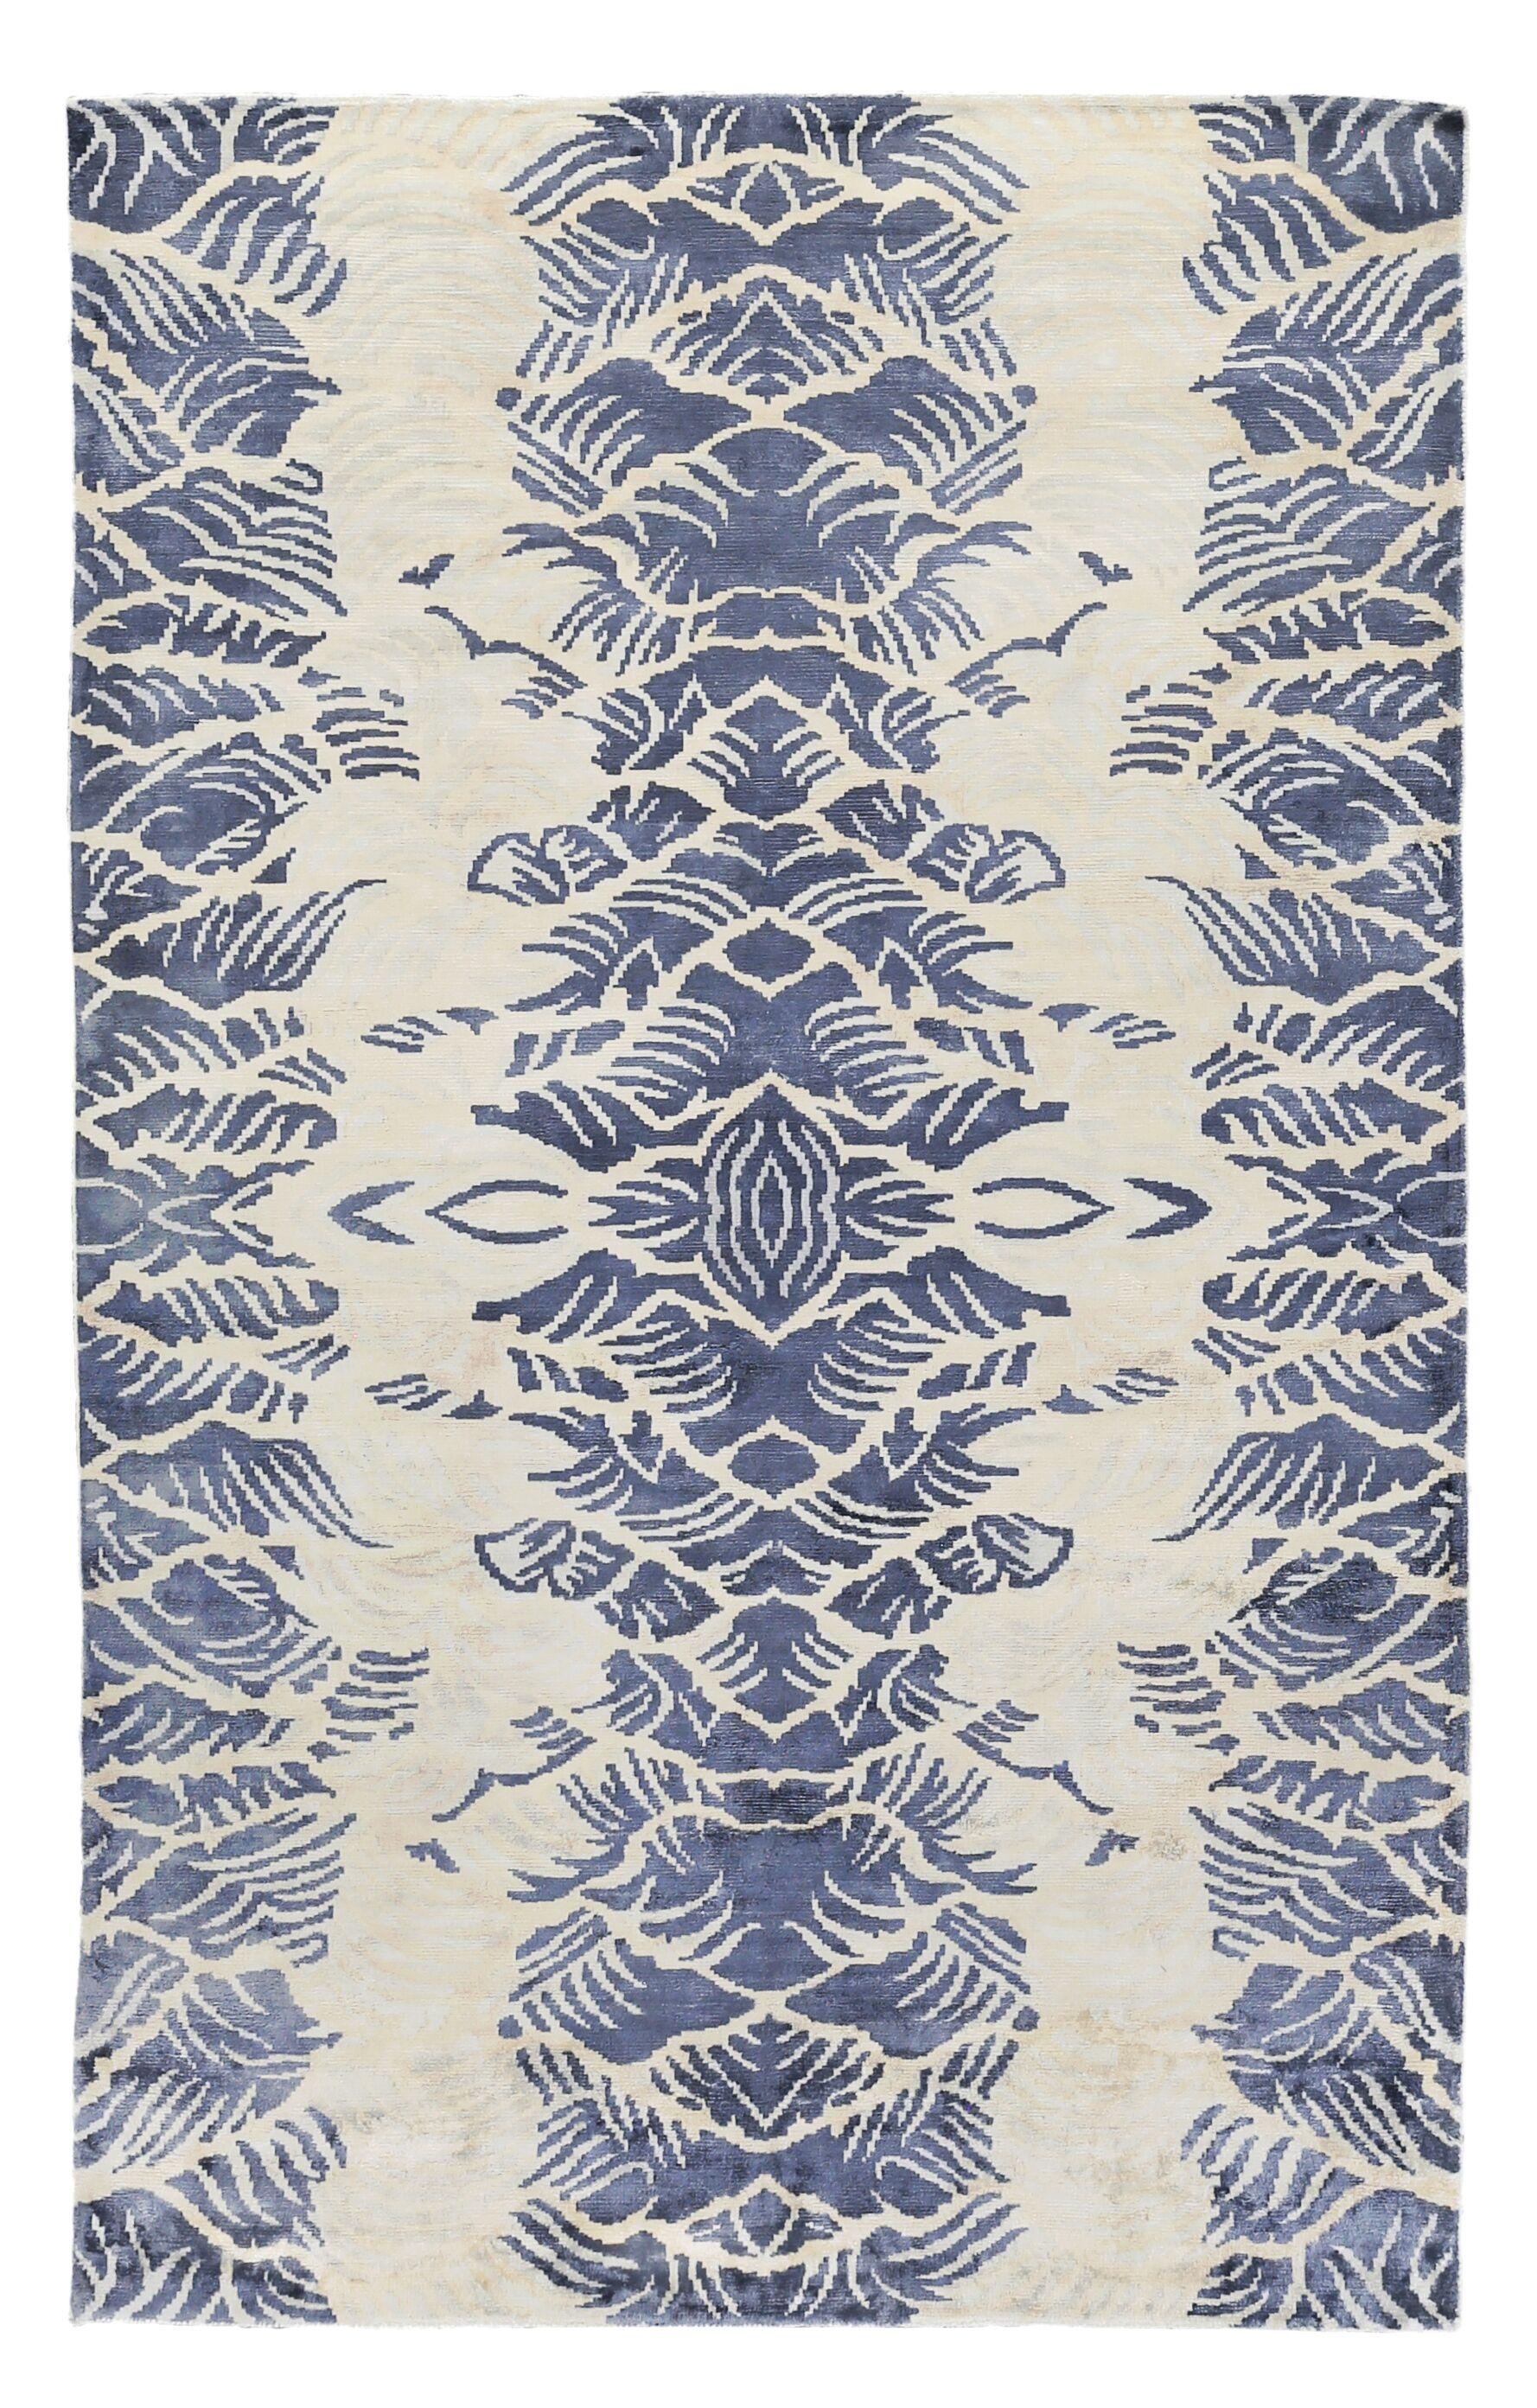 Koda Hand-Woven Ivory/Blue Area Rug Rug Size: Rectangle 6' x 9'